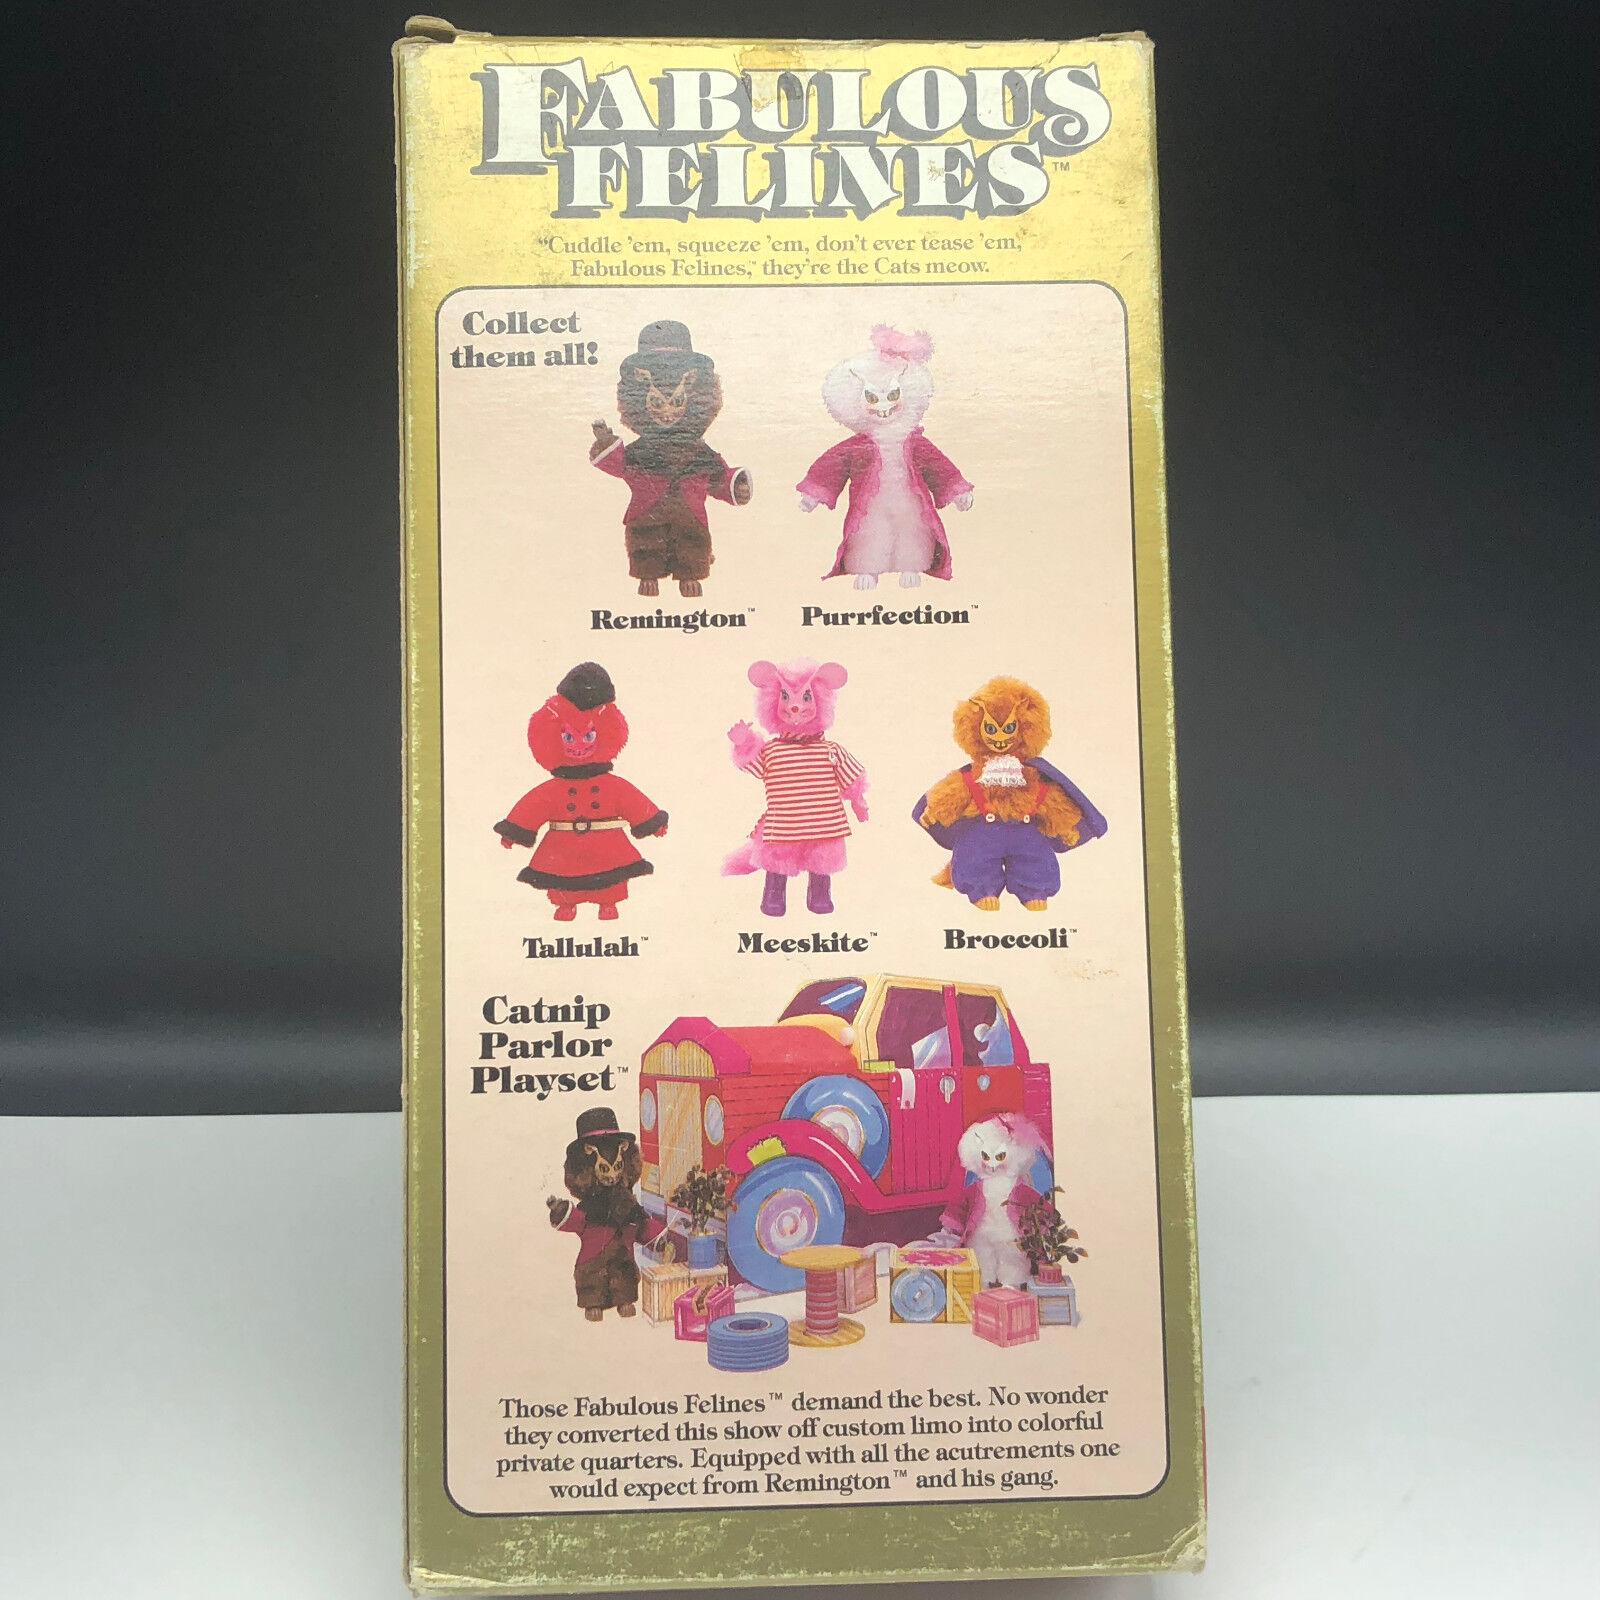 1983 1983 1983 FABULOUS FELINES MEGO ACTION FIGURE Phoenix toys cat plush Broccoli bluee 8bdc36